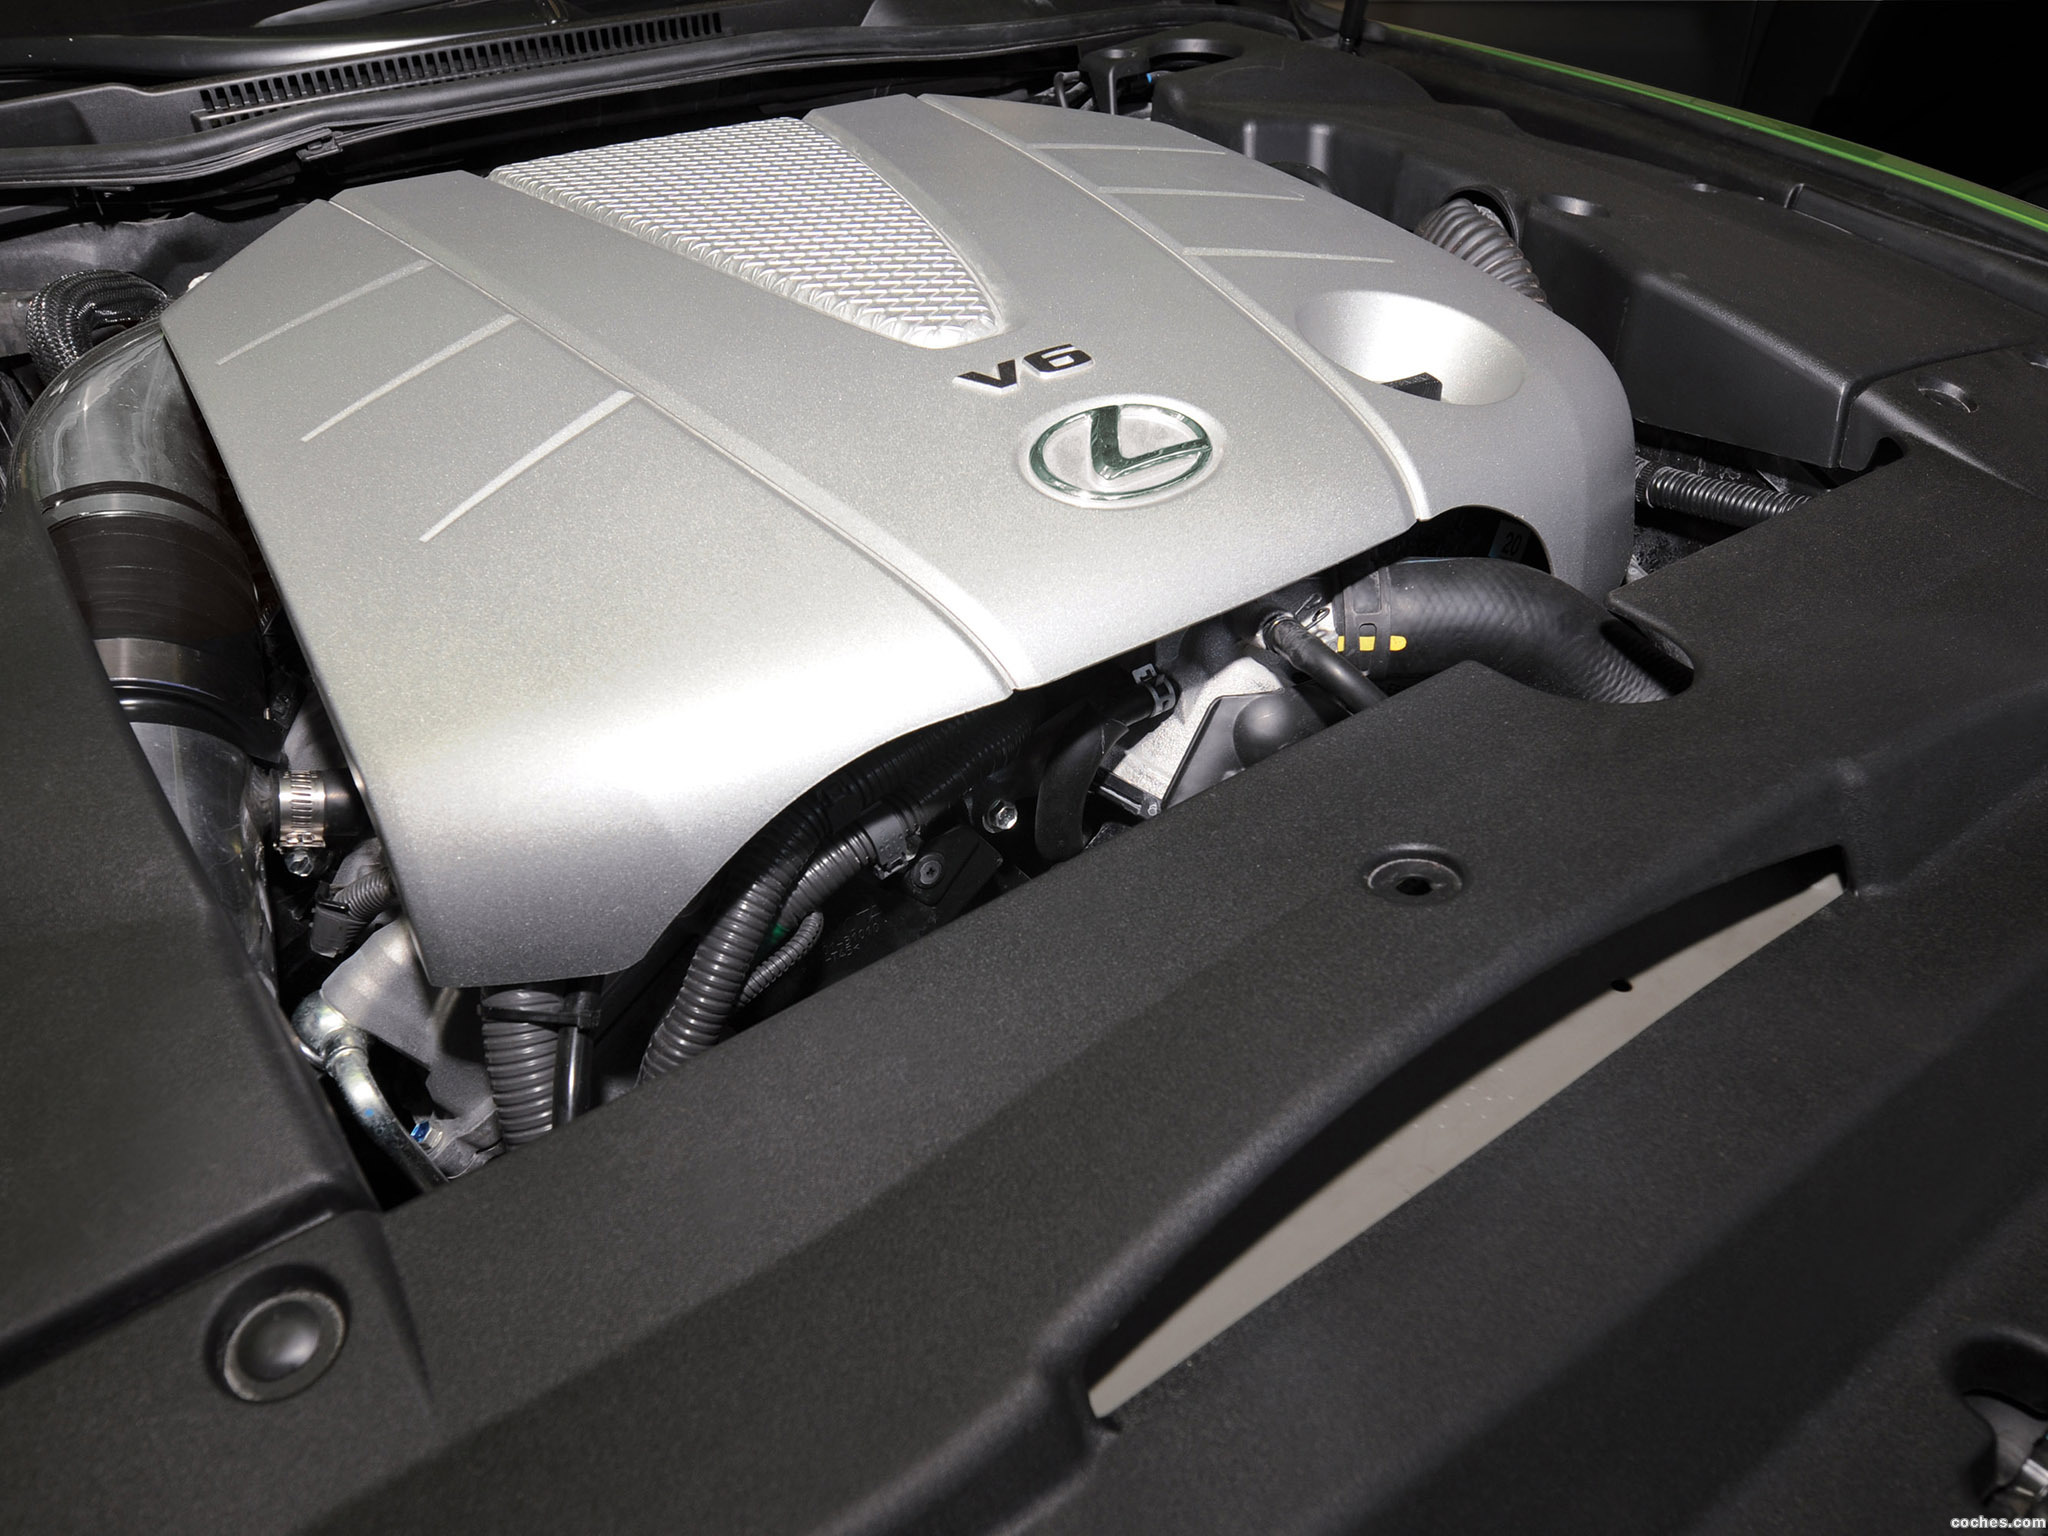 Foto 3 de Lexus IS 350C Supercharged V6 by Fox Marketing 2009